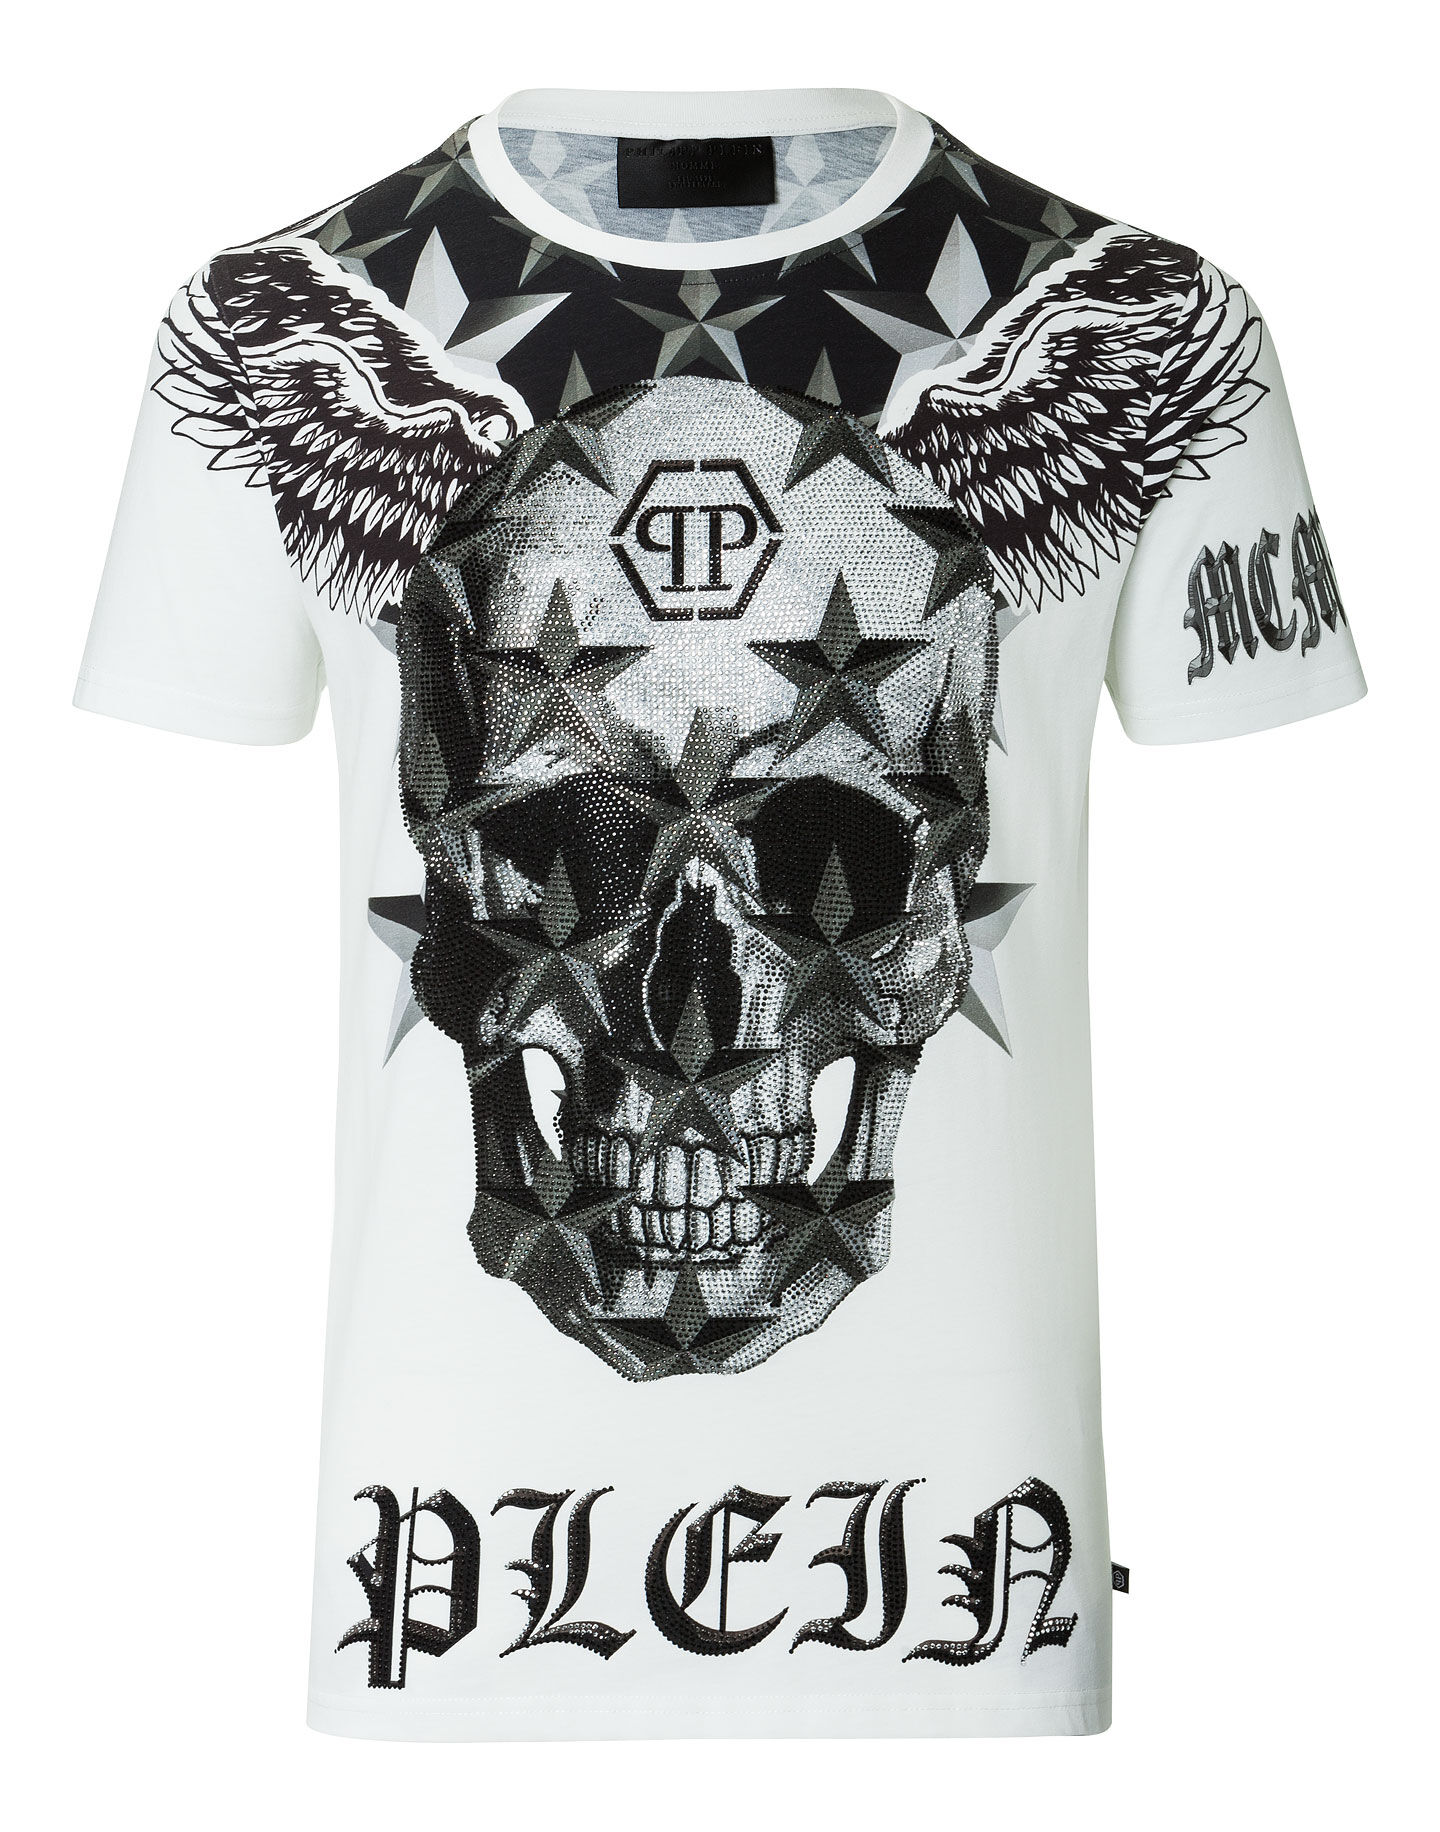 philipp plein t shirt 2017